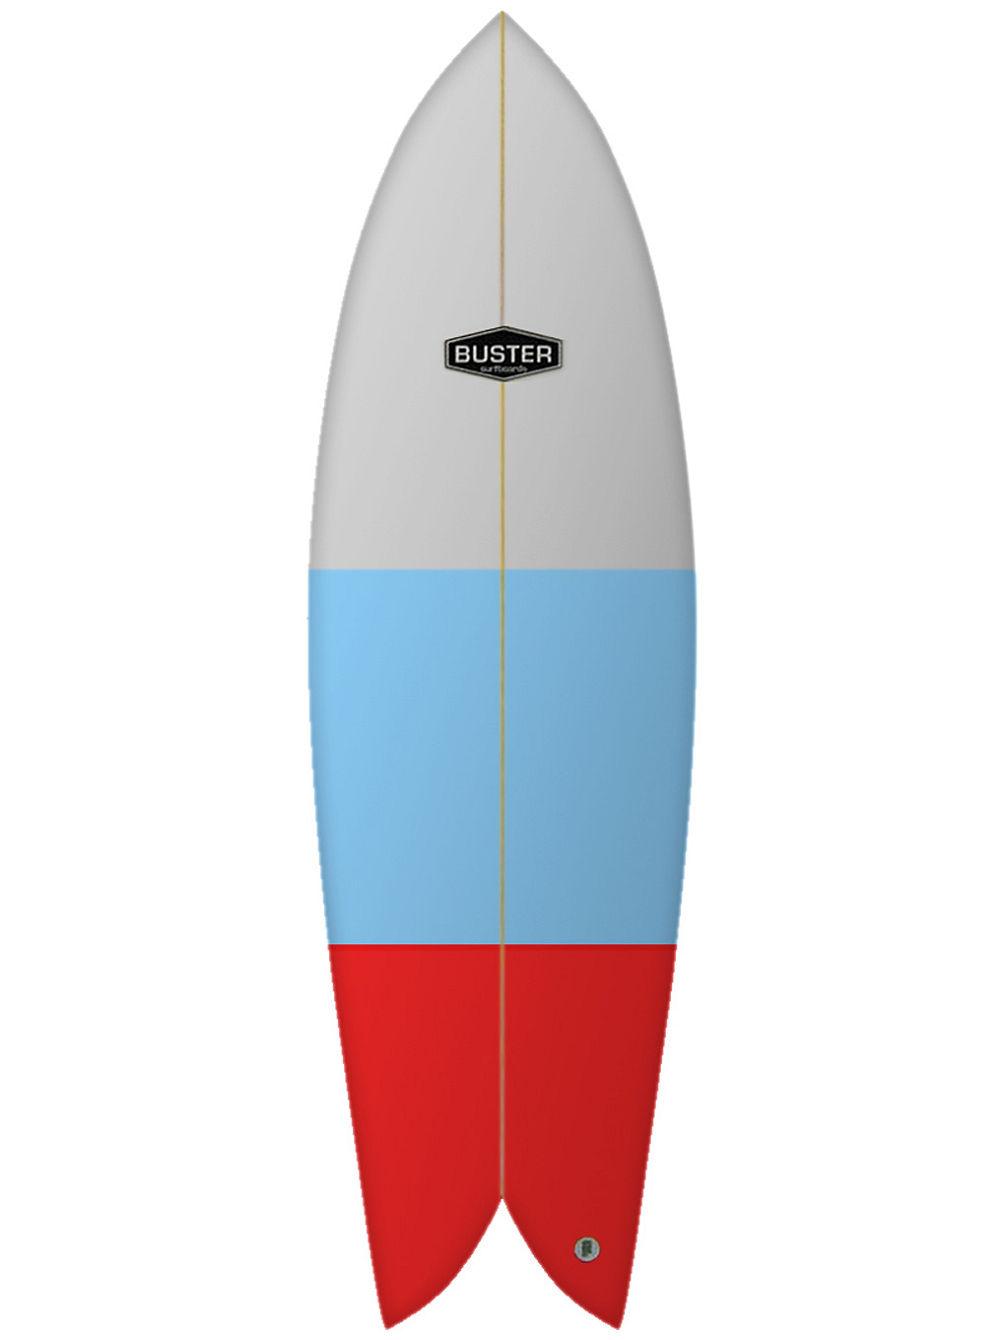 Buster Surfboard 6 39 4 22 39 39 1 2 3 39 39 Retro Fish